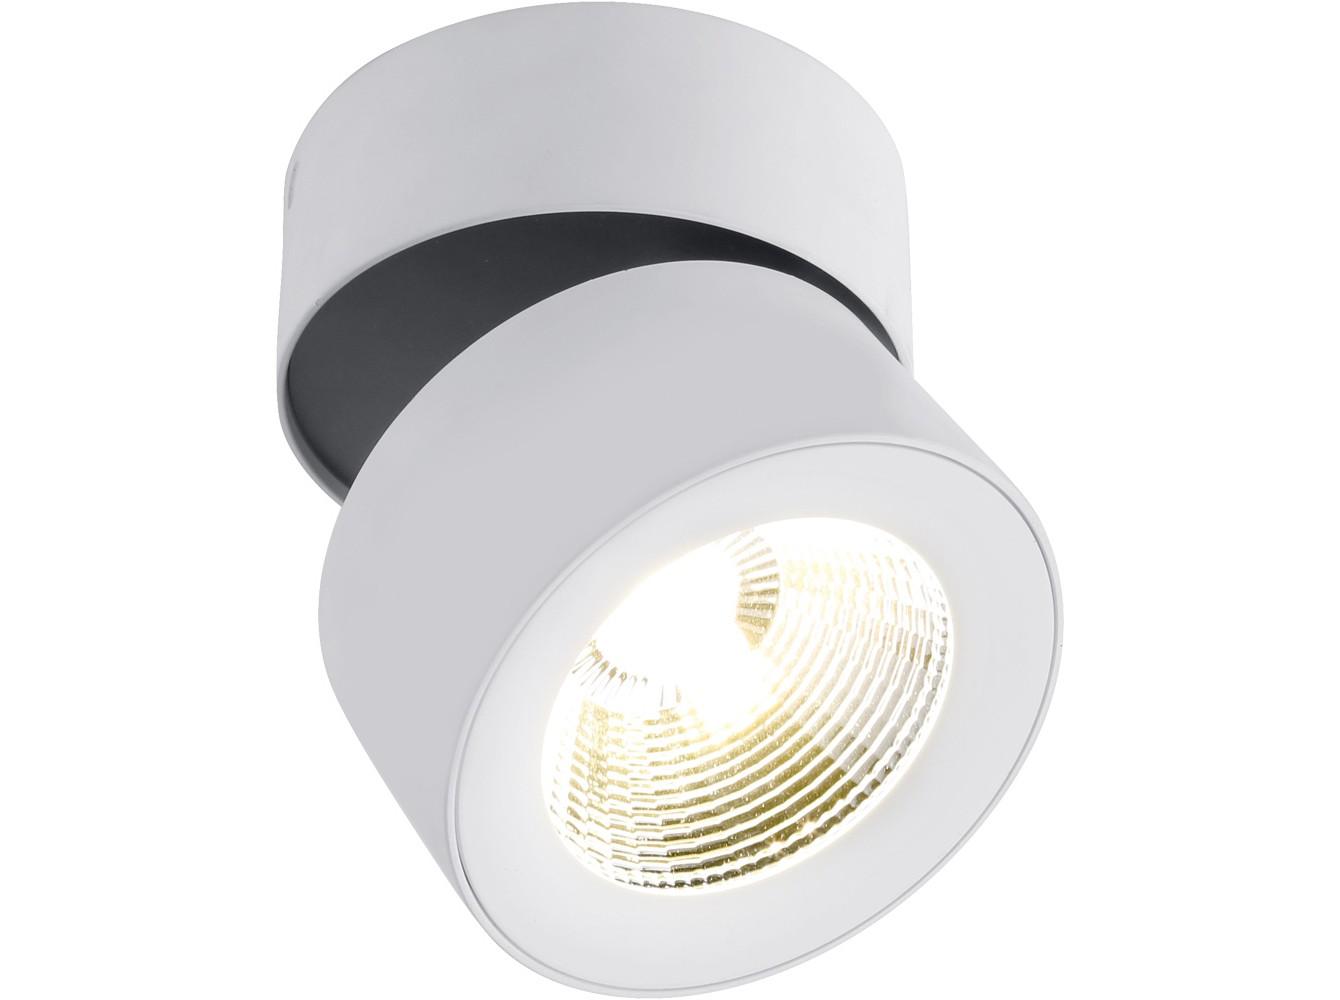 СпотСпоты<br>&amp;lt;div&amp;gt;Вид цоколя: LED&amp;lt;/div&amp;gt;&amp;lt;div&amp;gt;Мощность ламп: 10W (эквивалент 100W)&amp;lt;/div&amp;gt;&amp;lt;div&amp;gt;Количество ламп: 1&amp;lt;/div&amp;gt;&amp;lt;div&amp;gt;Наличие ламп: да&amp;lt;/div&amp;gt;<br><br>Material: Алюминий<br>Height см: 9,4<br>Diameter см: 10